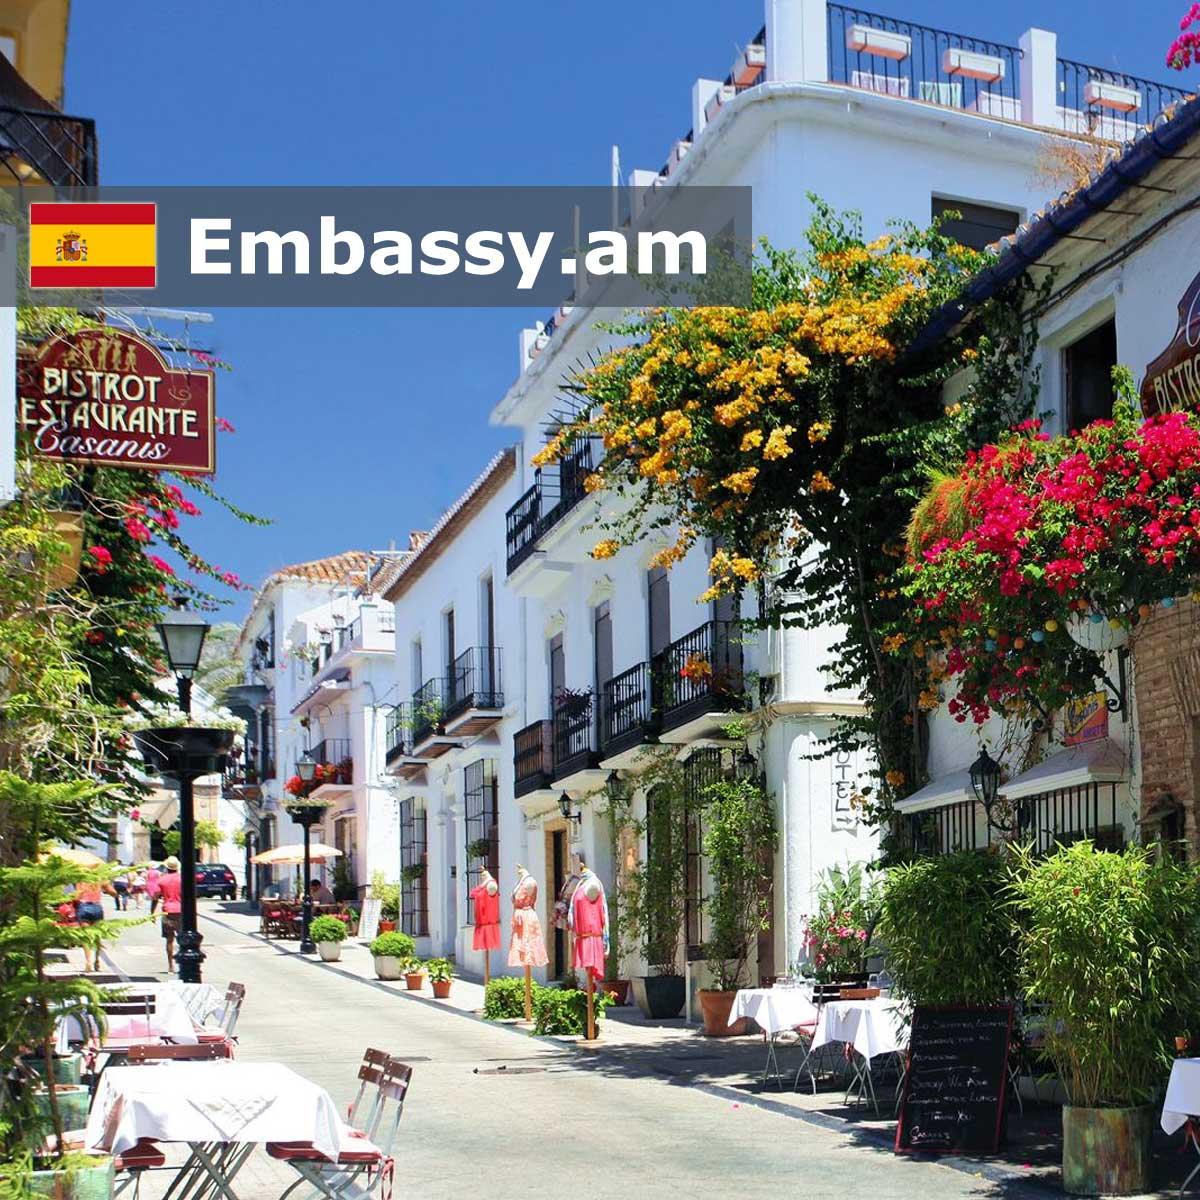 Marbella - Hotels in Spain - Embassy.am